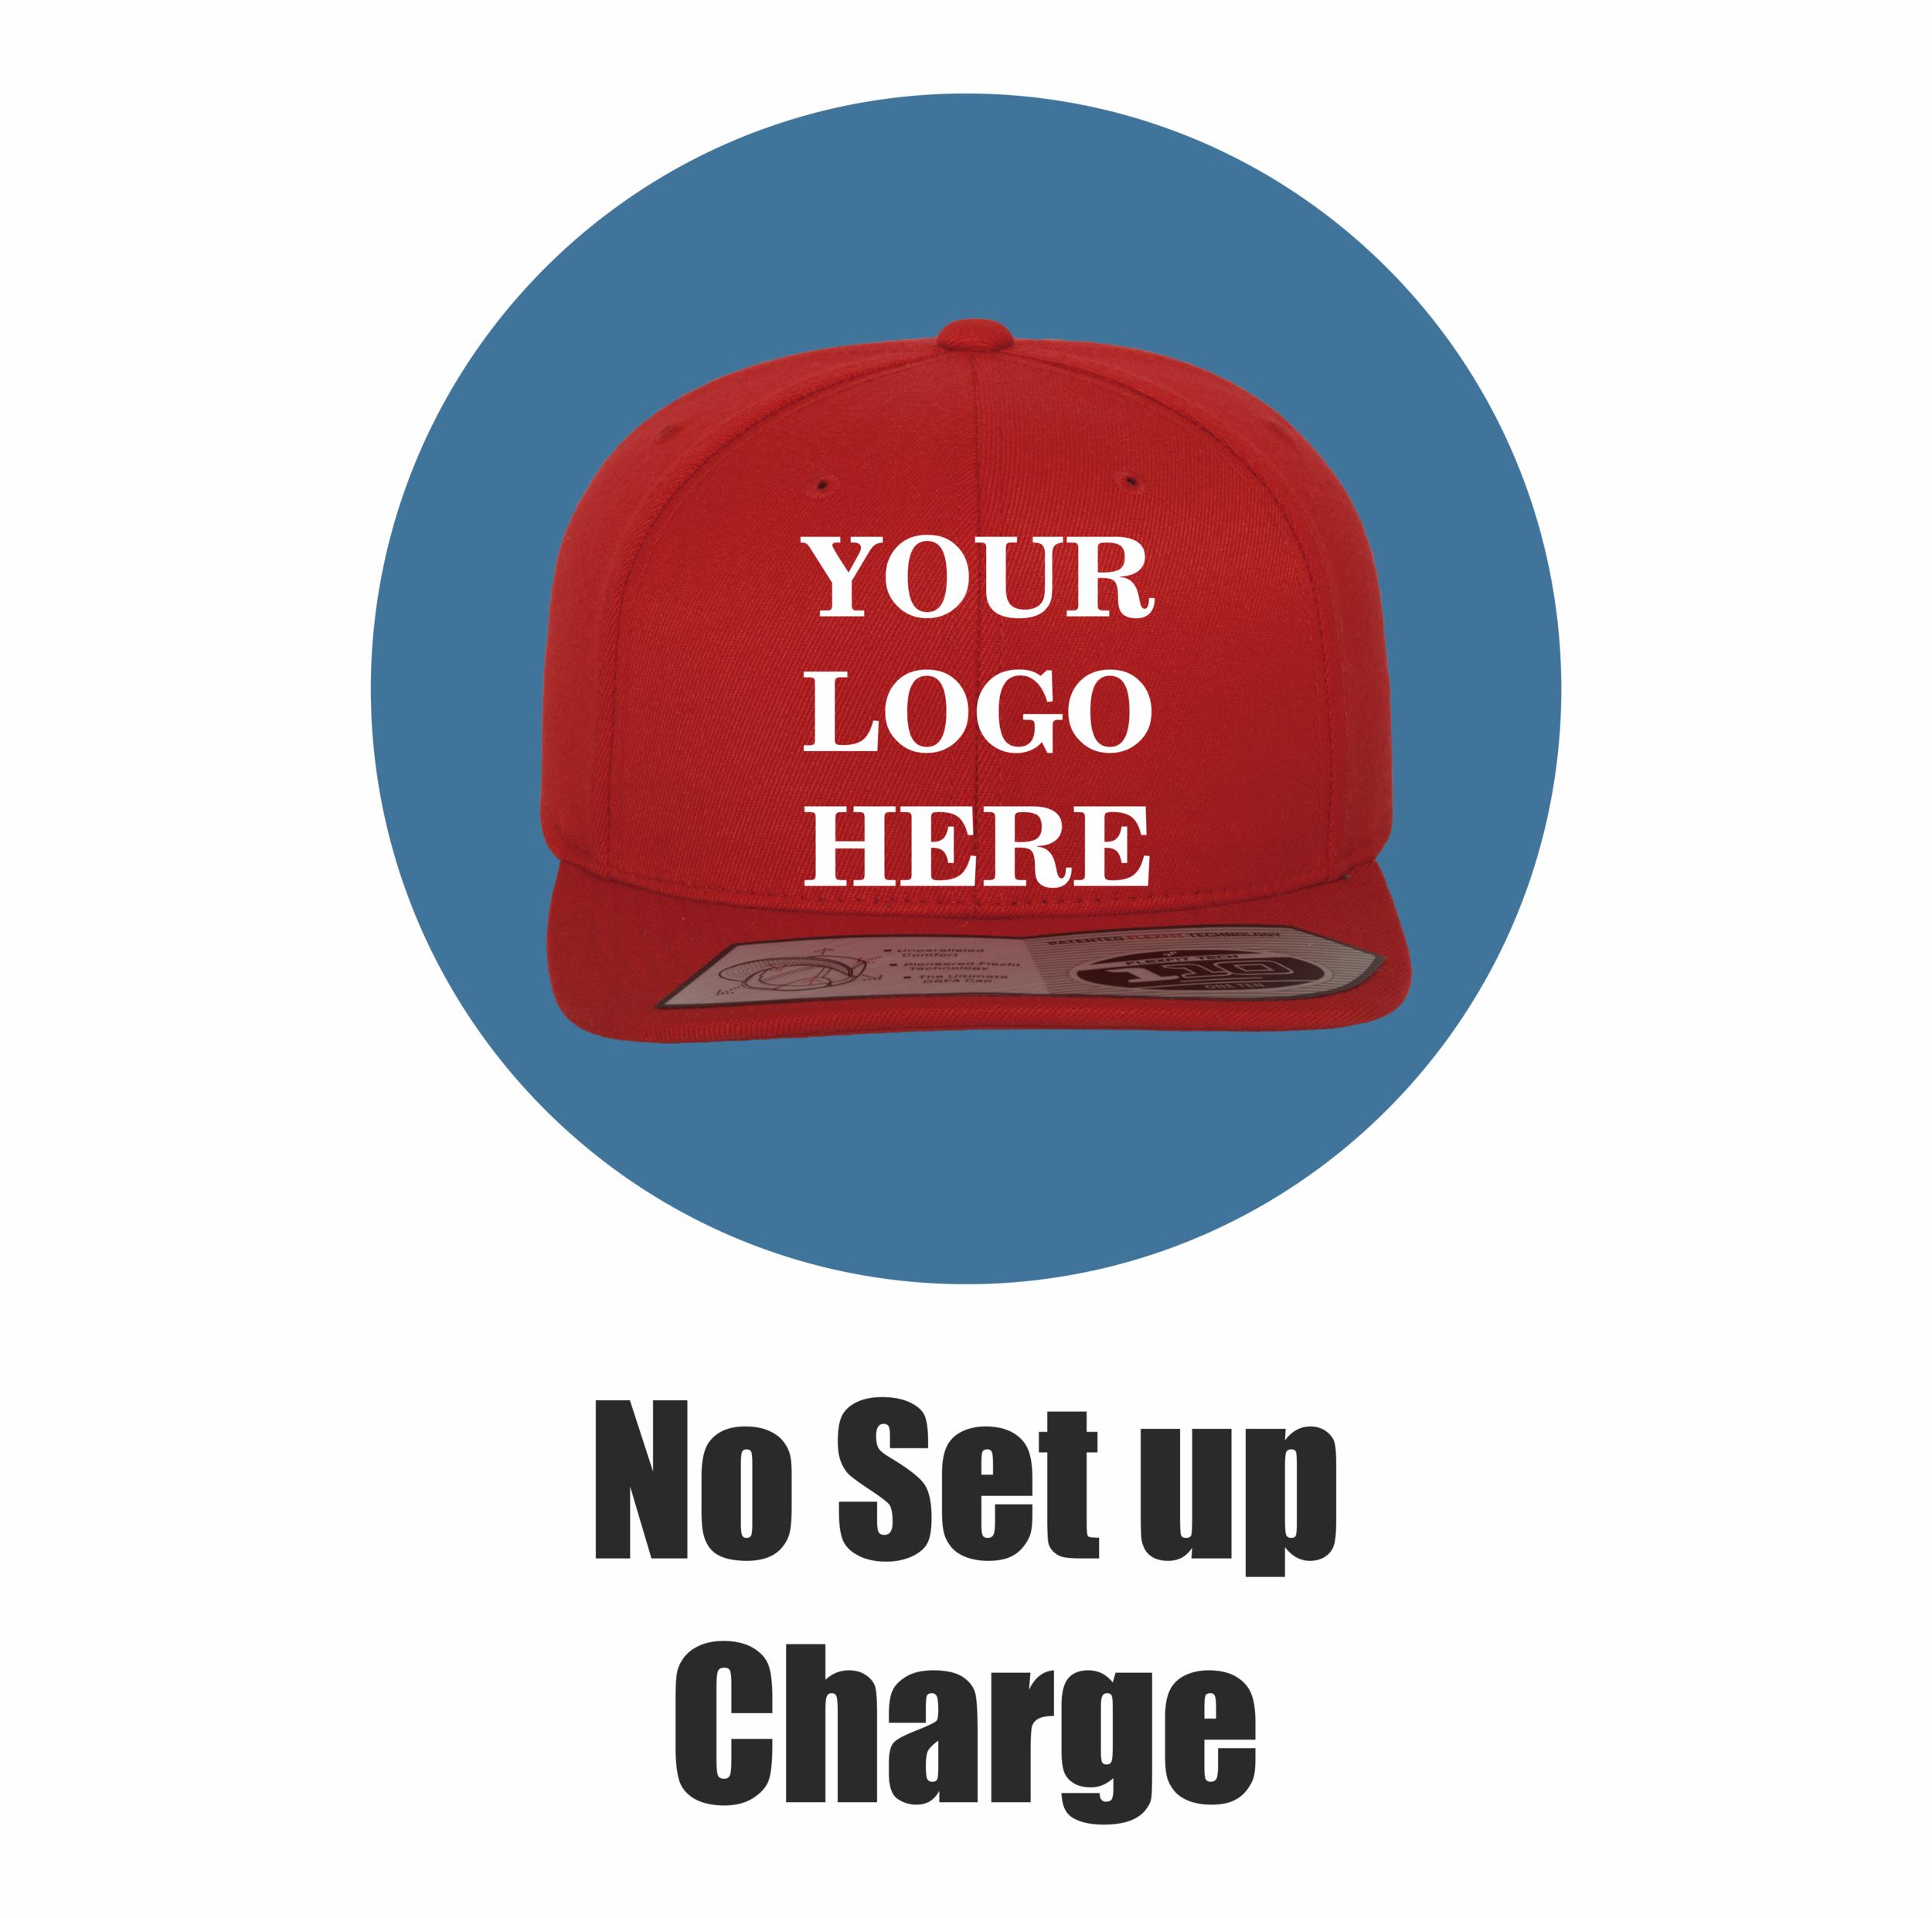 Yupoong Flexfit by London Snapbacks No set up charge.png